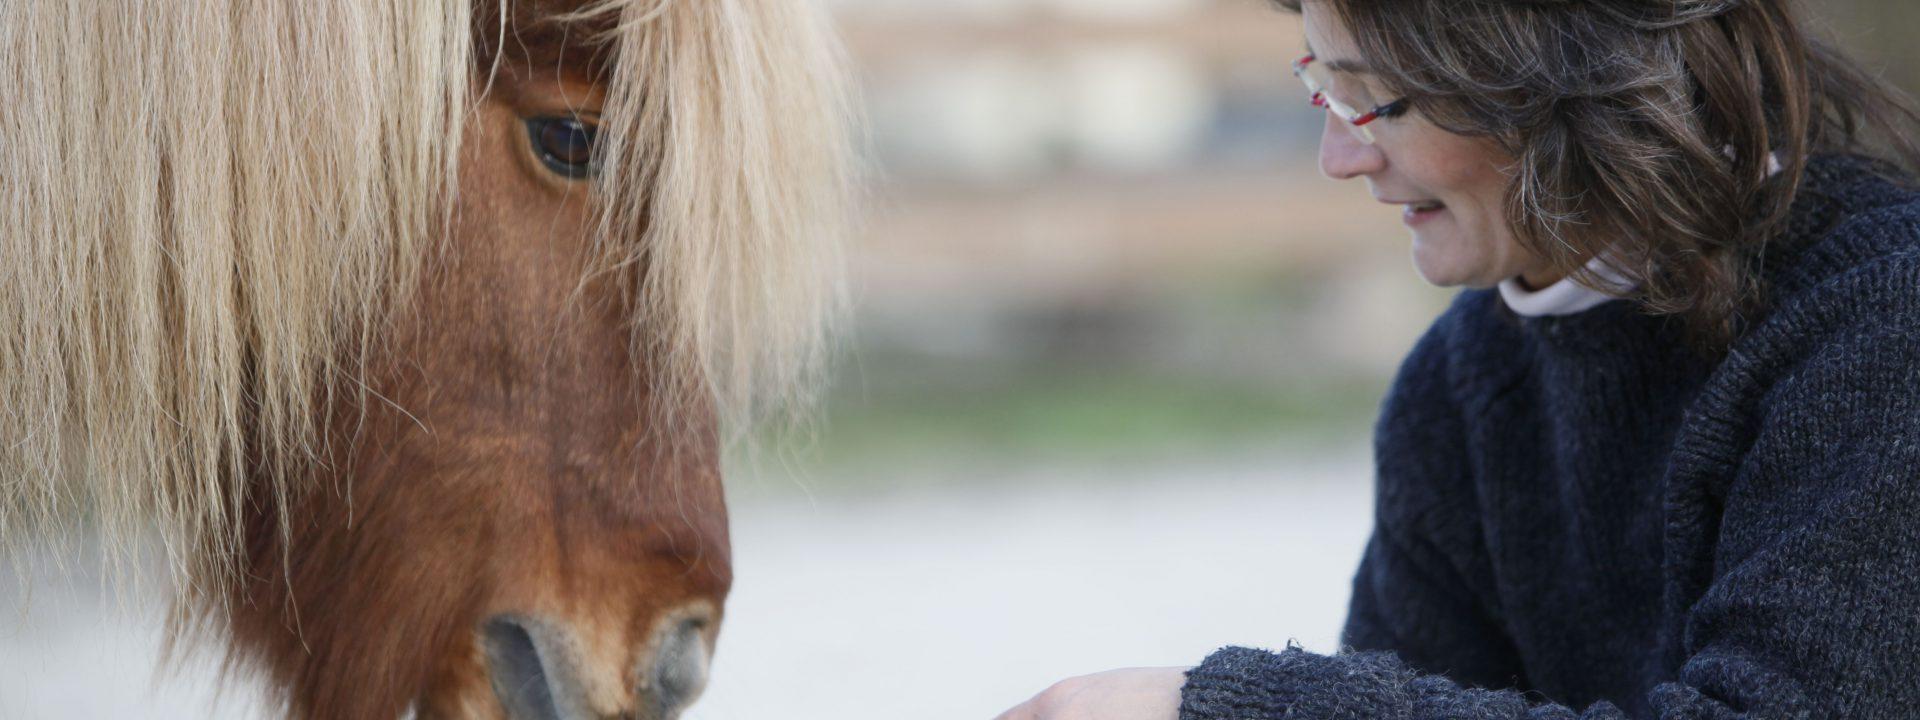 Den Ponys ganz nah